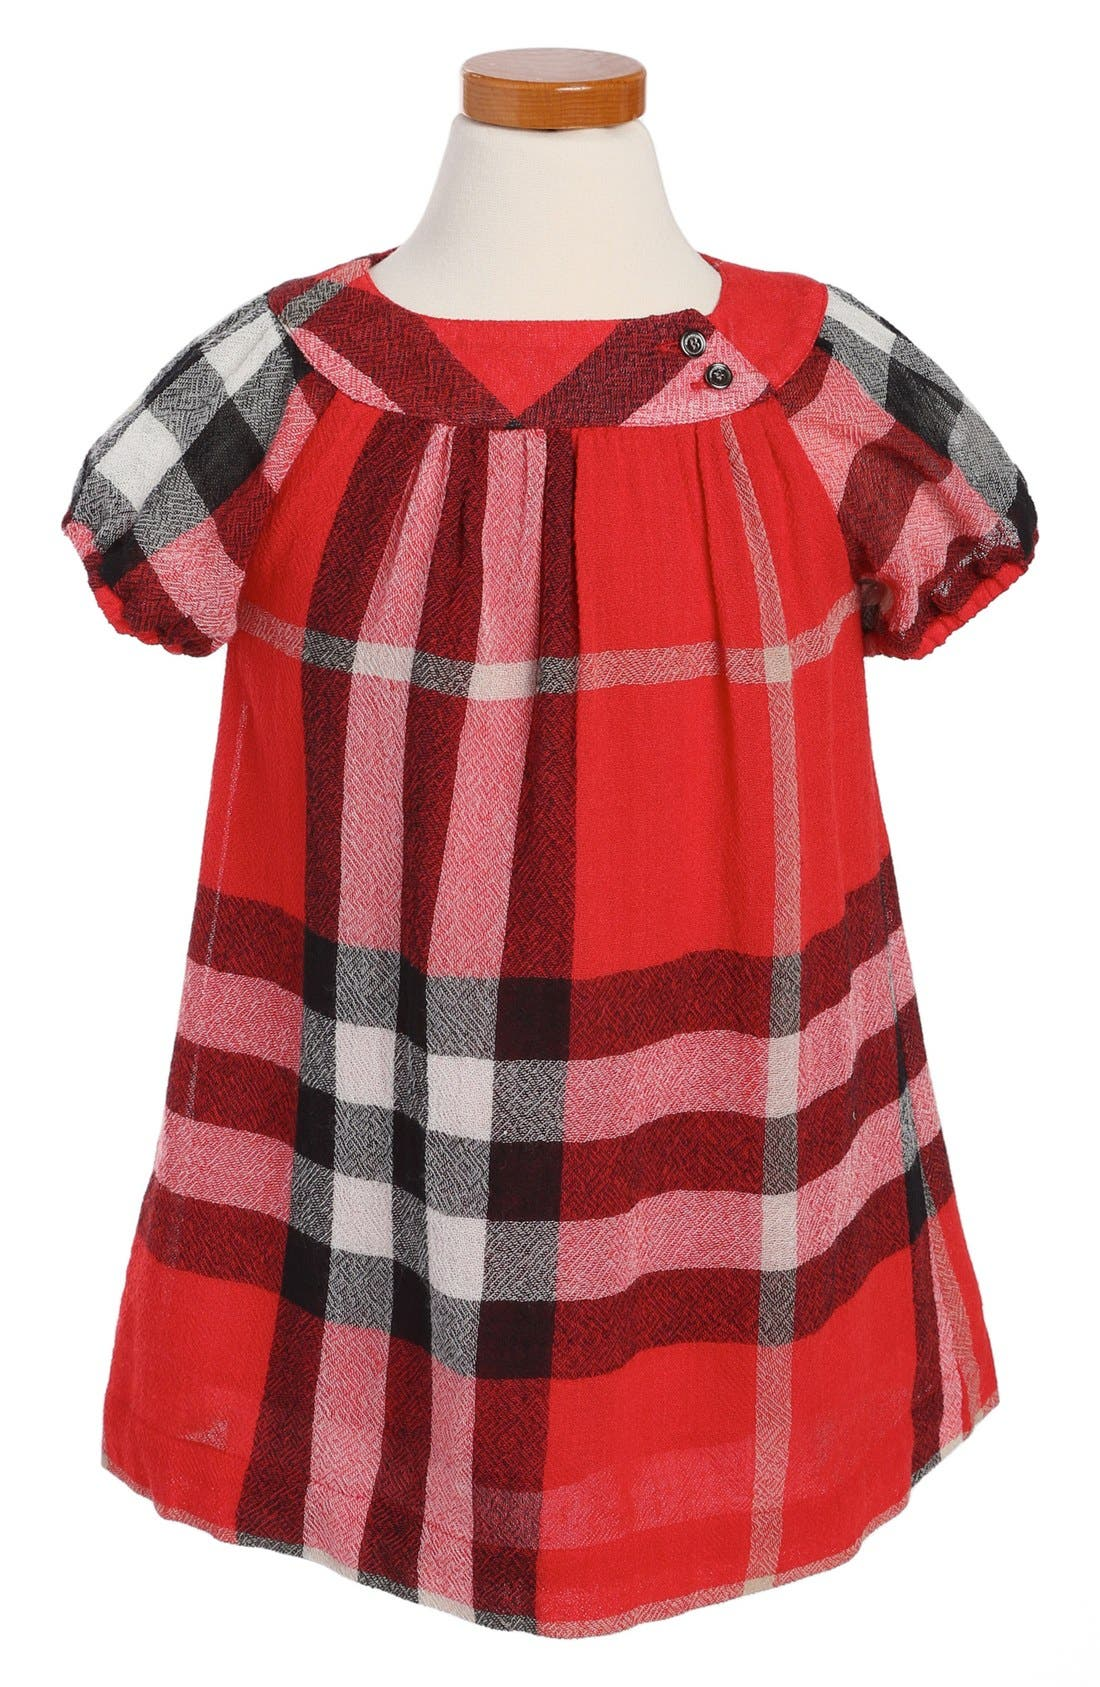 Alternate Image 1 Selected - Burberry 'Delany' Dress (Toddler Girls)